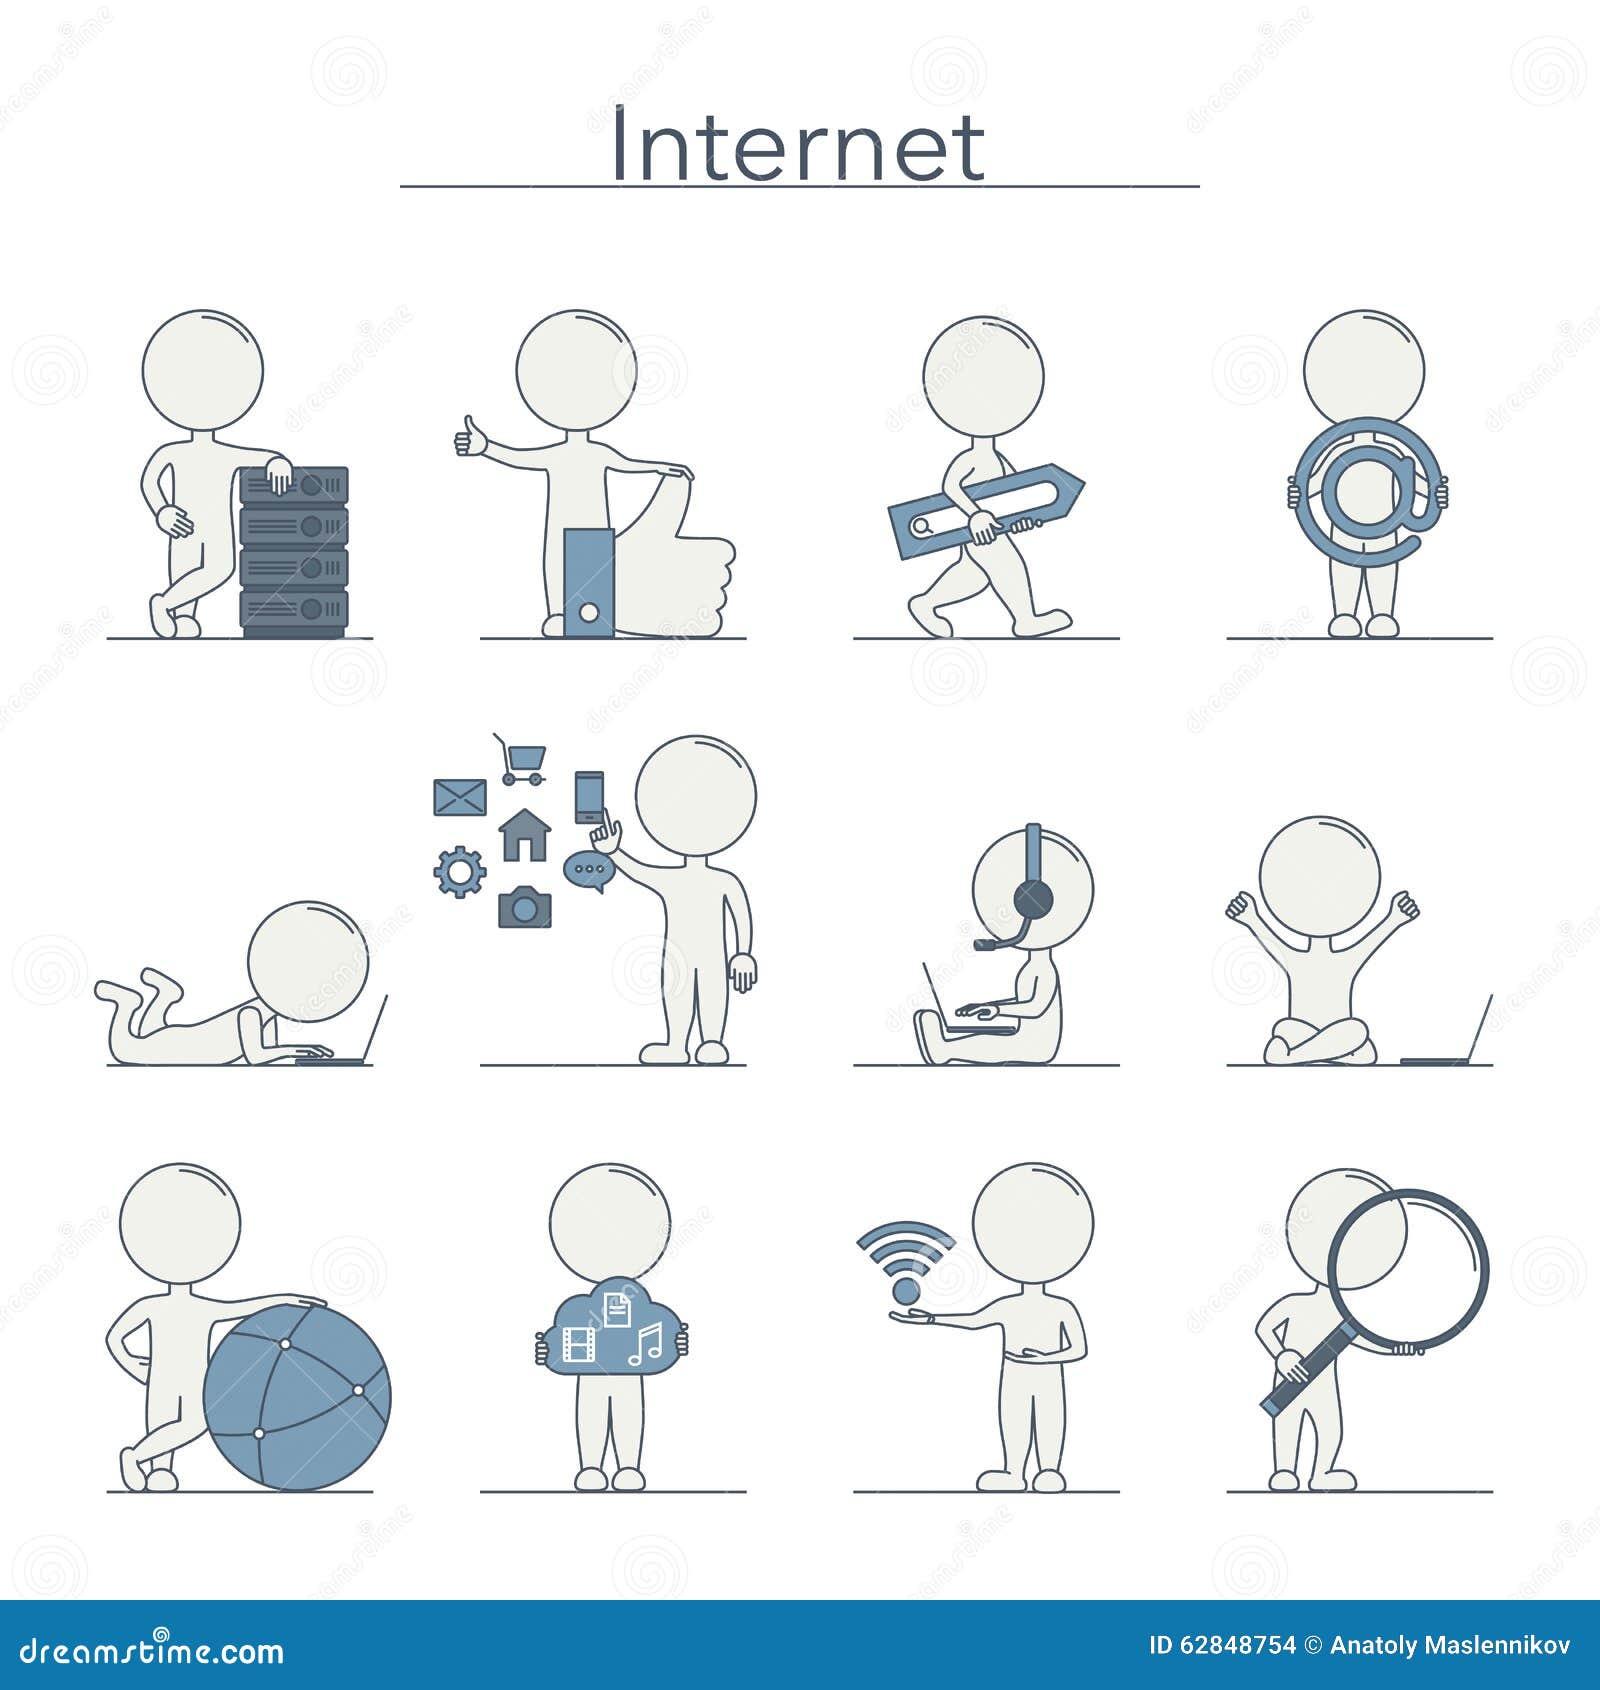 Outline People - Internet